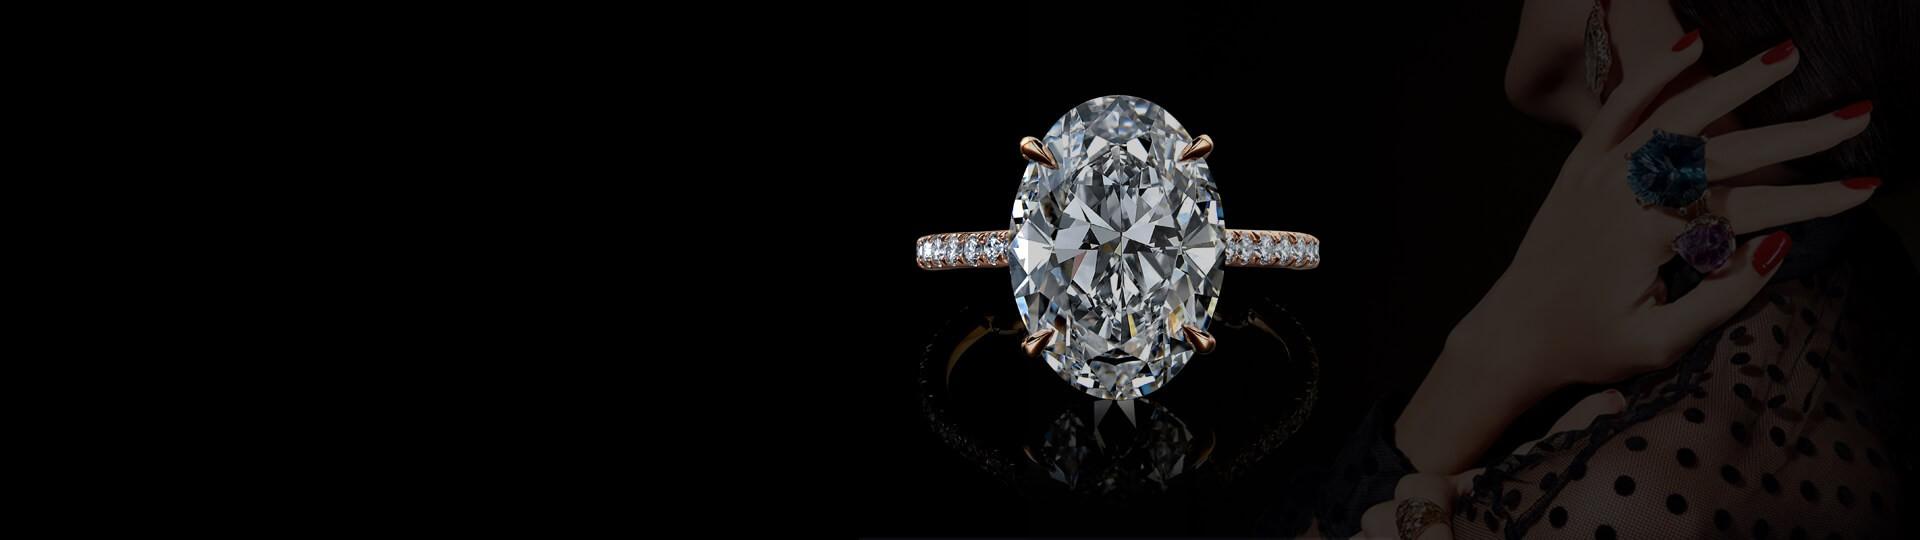 Of Women's Diamond